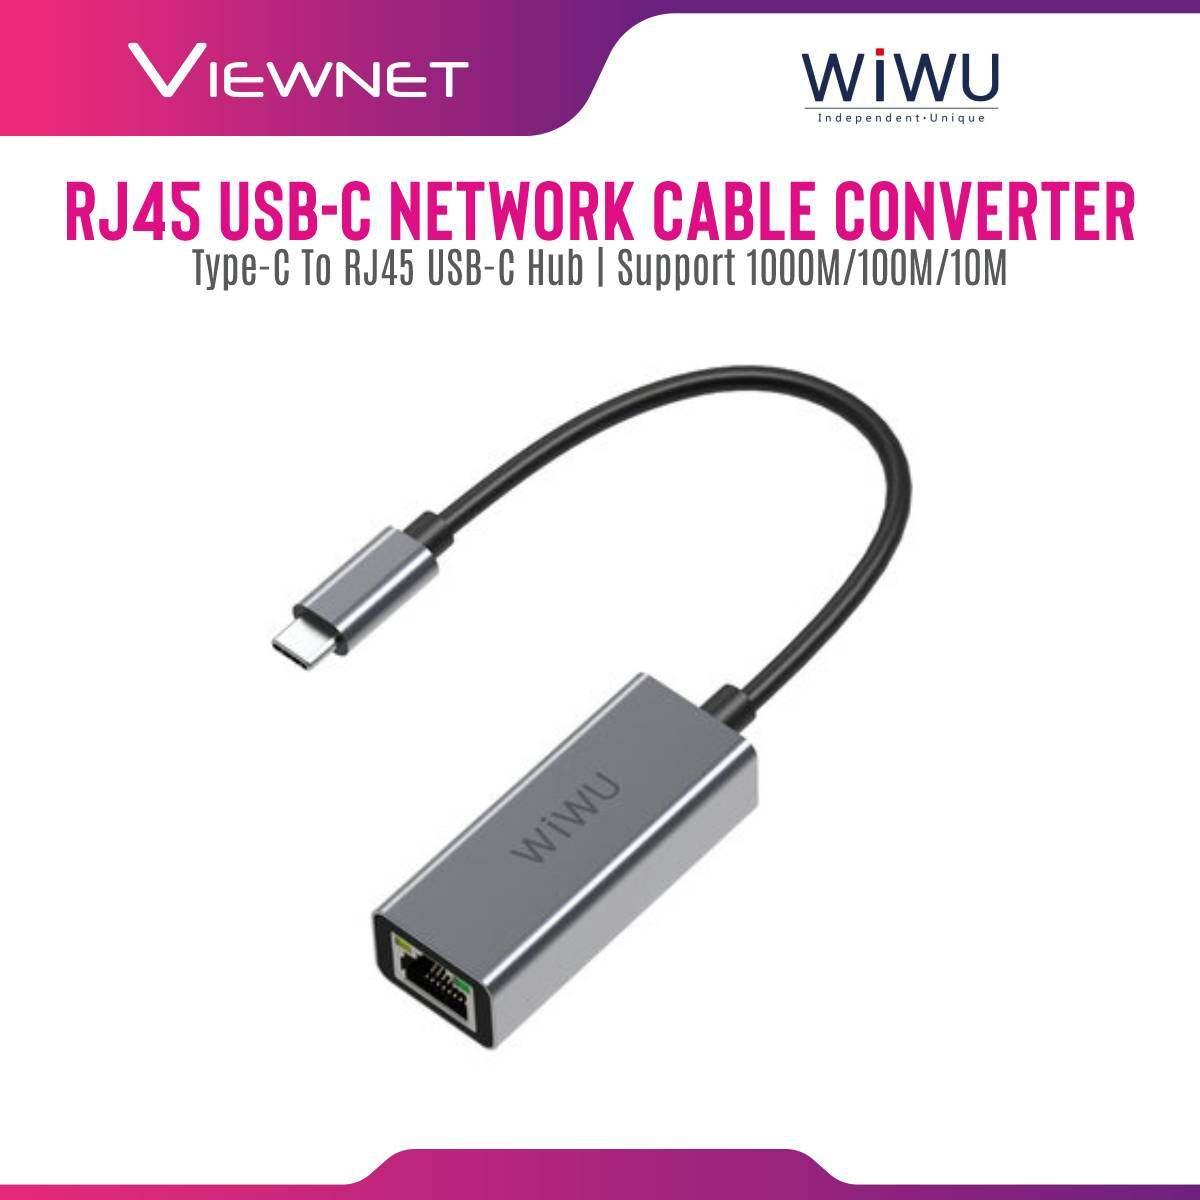 WIWU Alpha Type-C to RJ45 USB-C Hub 10/100/1000M Gigabit Network Cable Converter for MacBook Air Pro 2019 2020